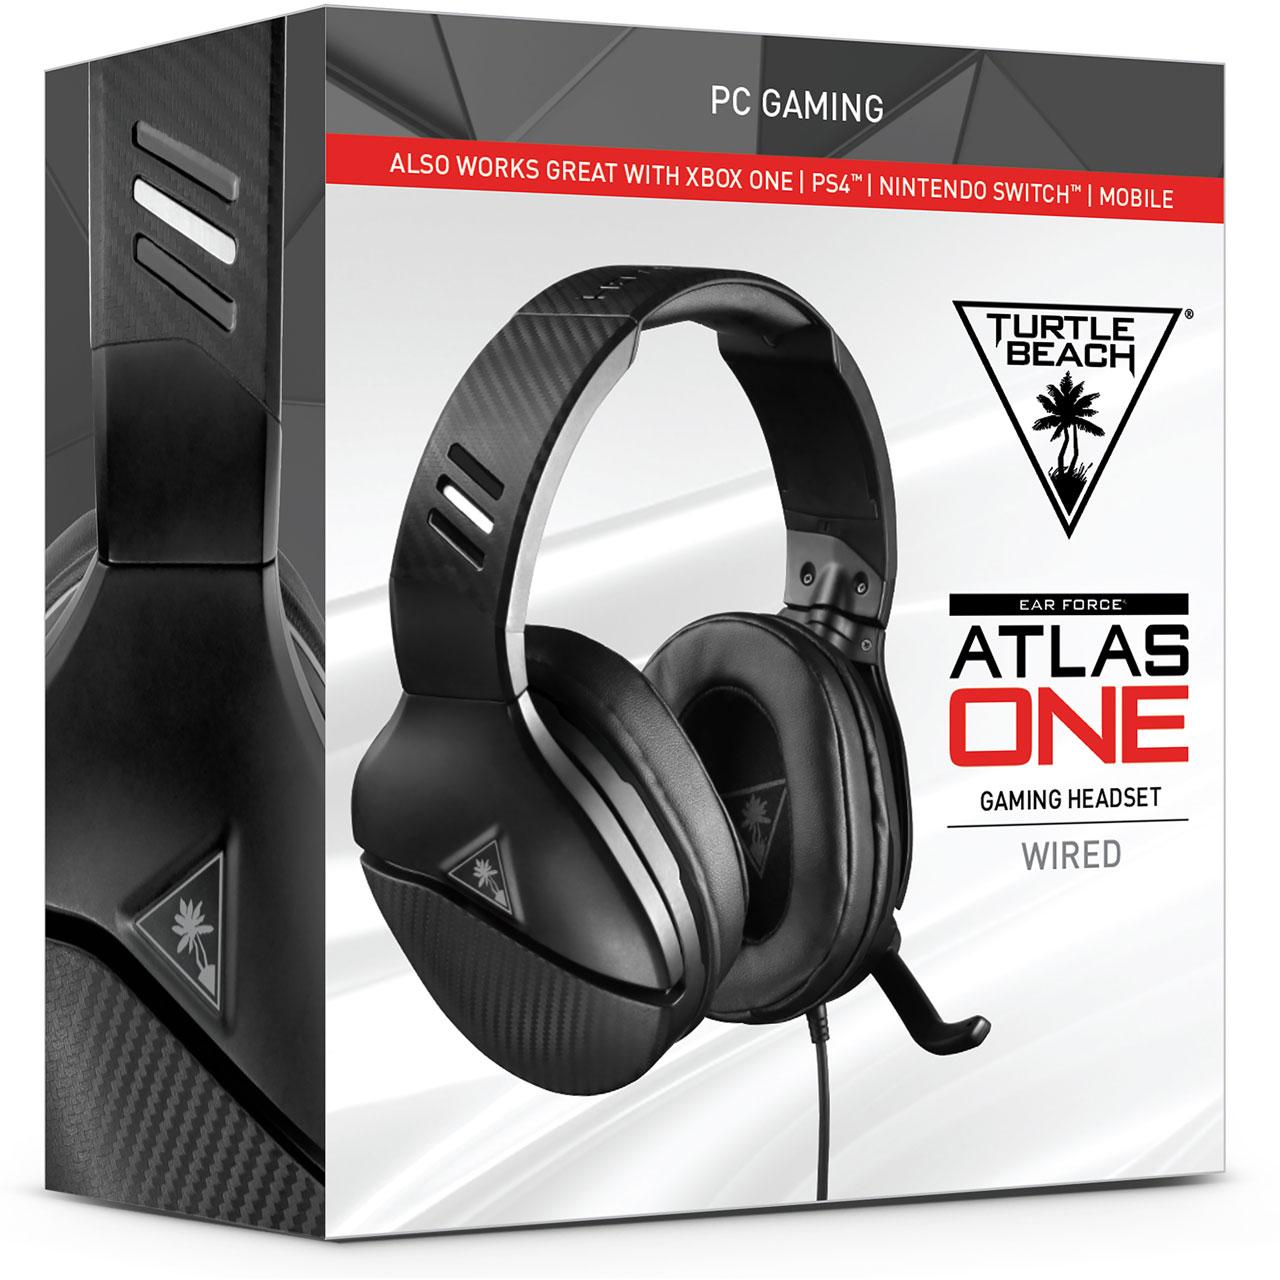 Turtle Beach Ear Force Atlas One Gaming Headset